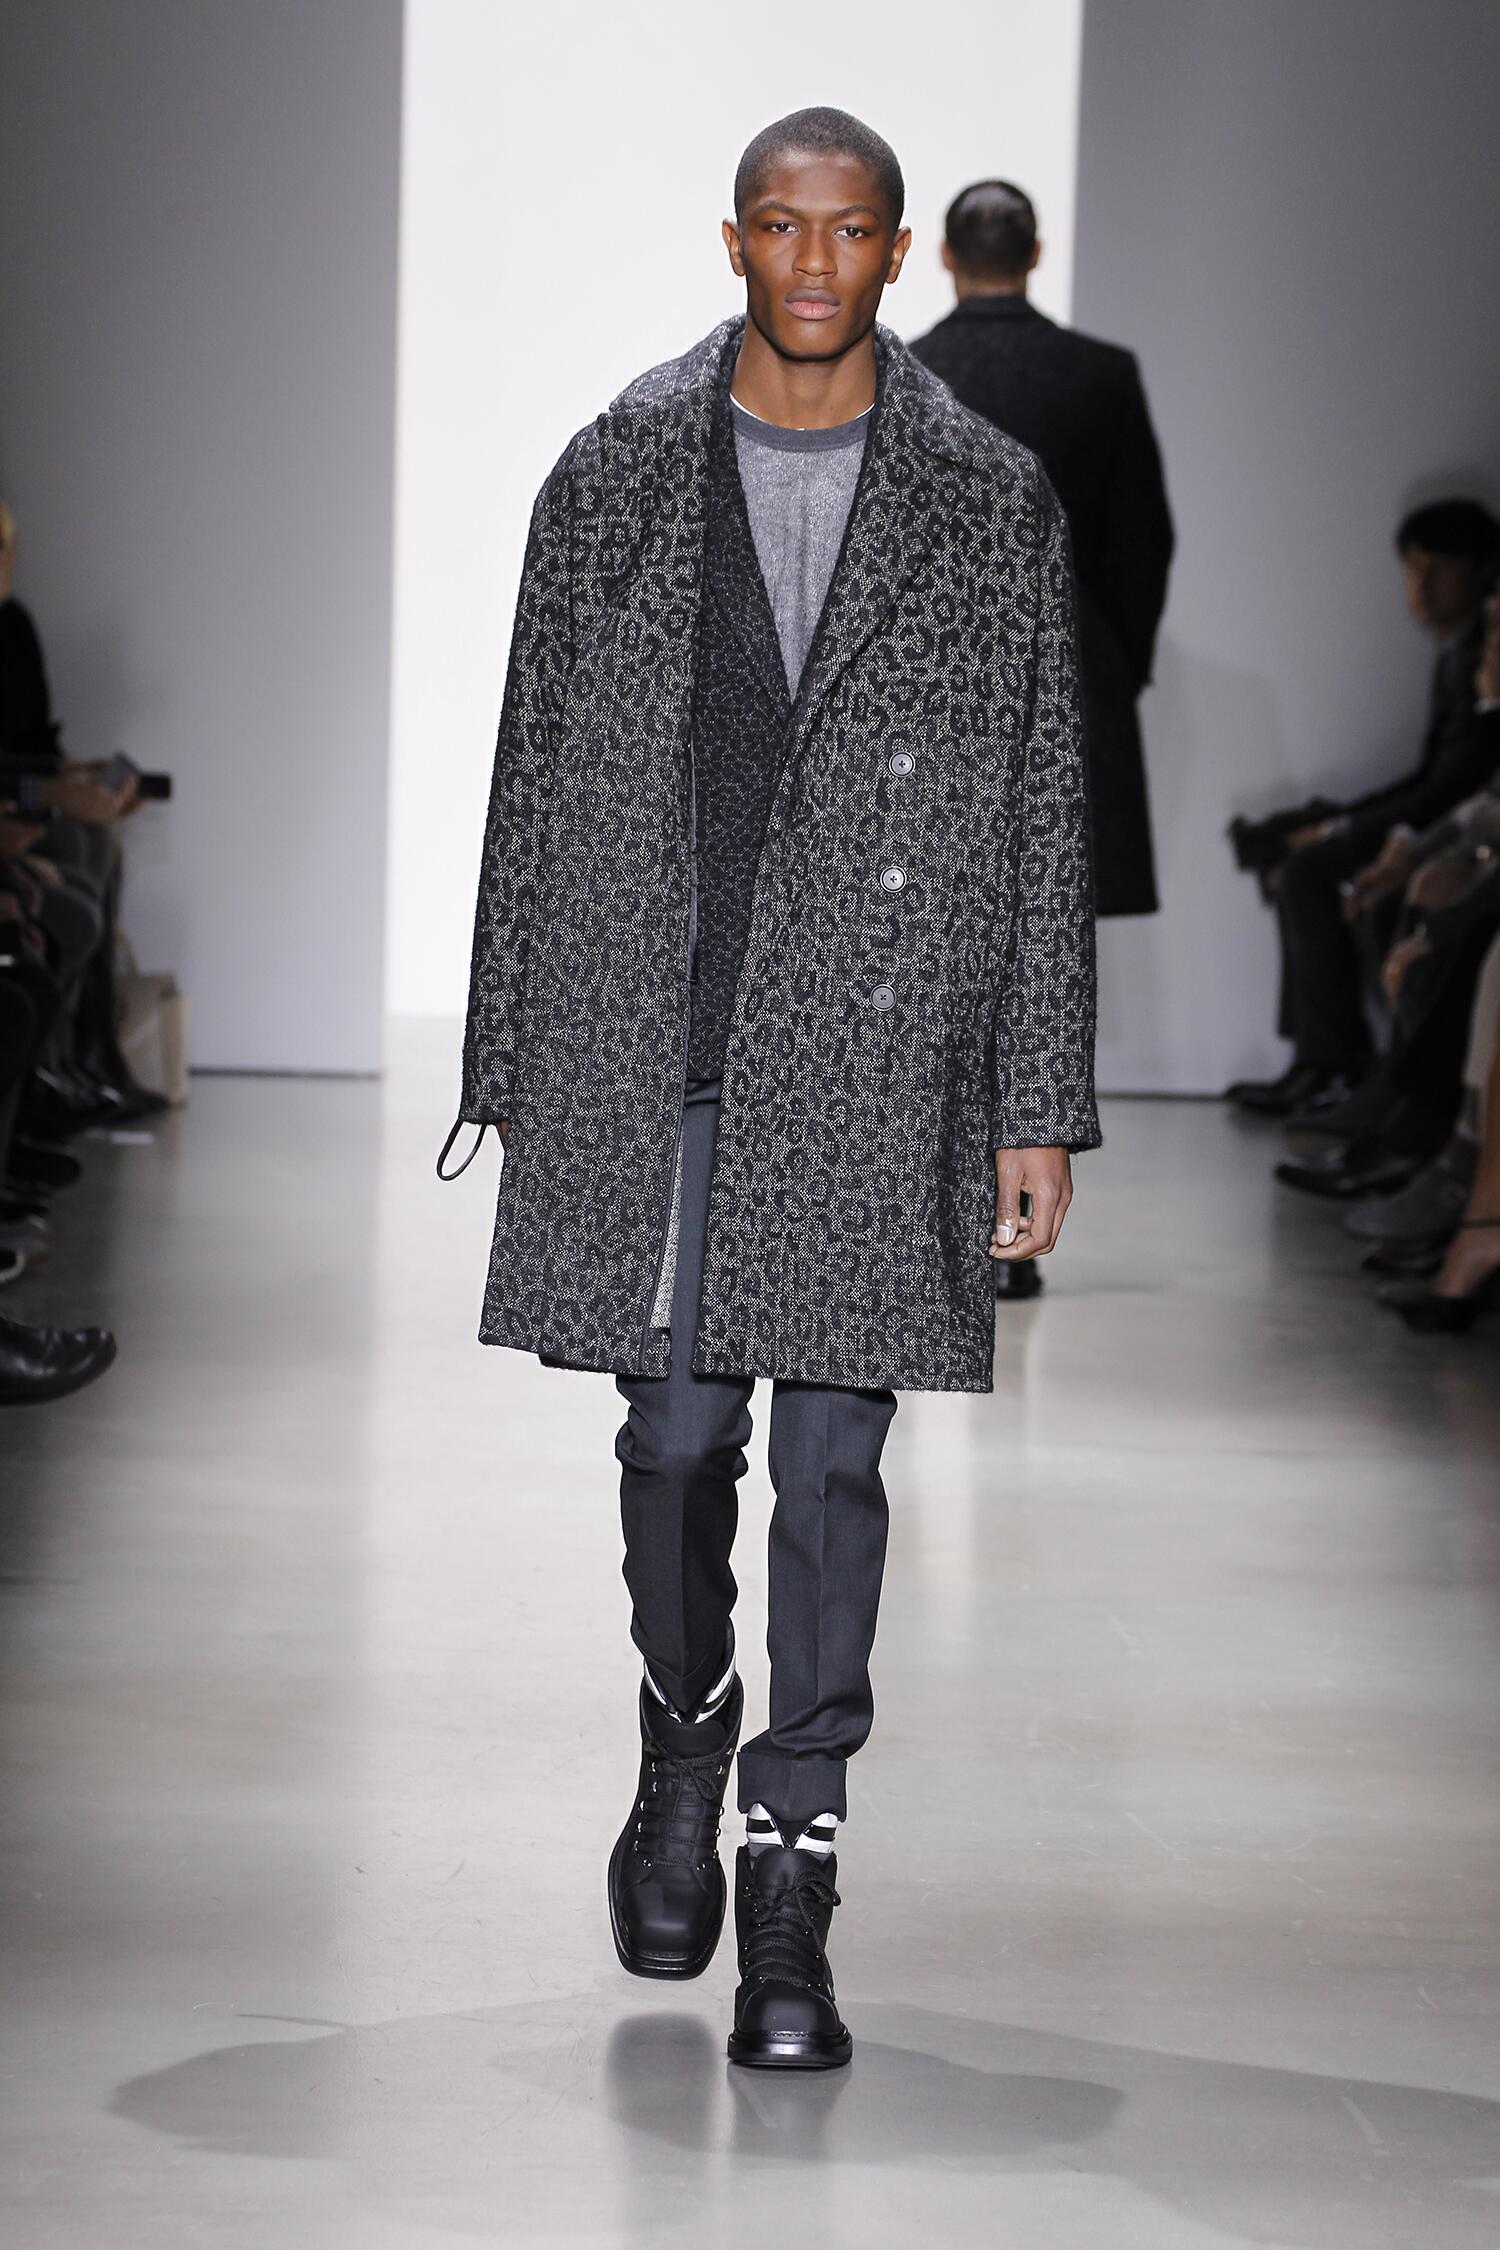 Calvin Klein Fall Winter 2015 16 Mens Collection Milano Fashion Week